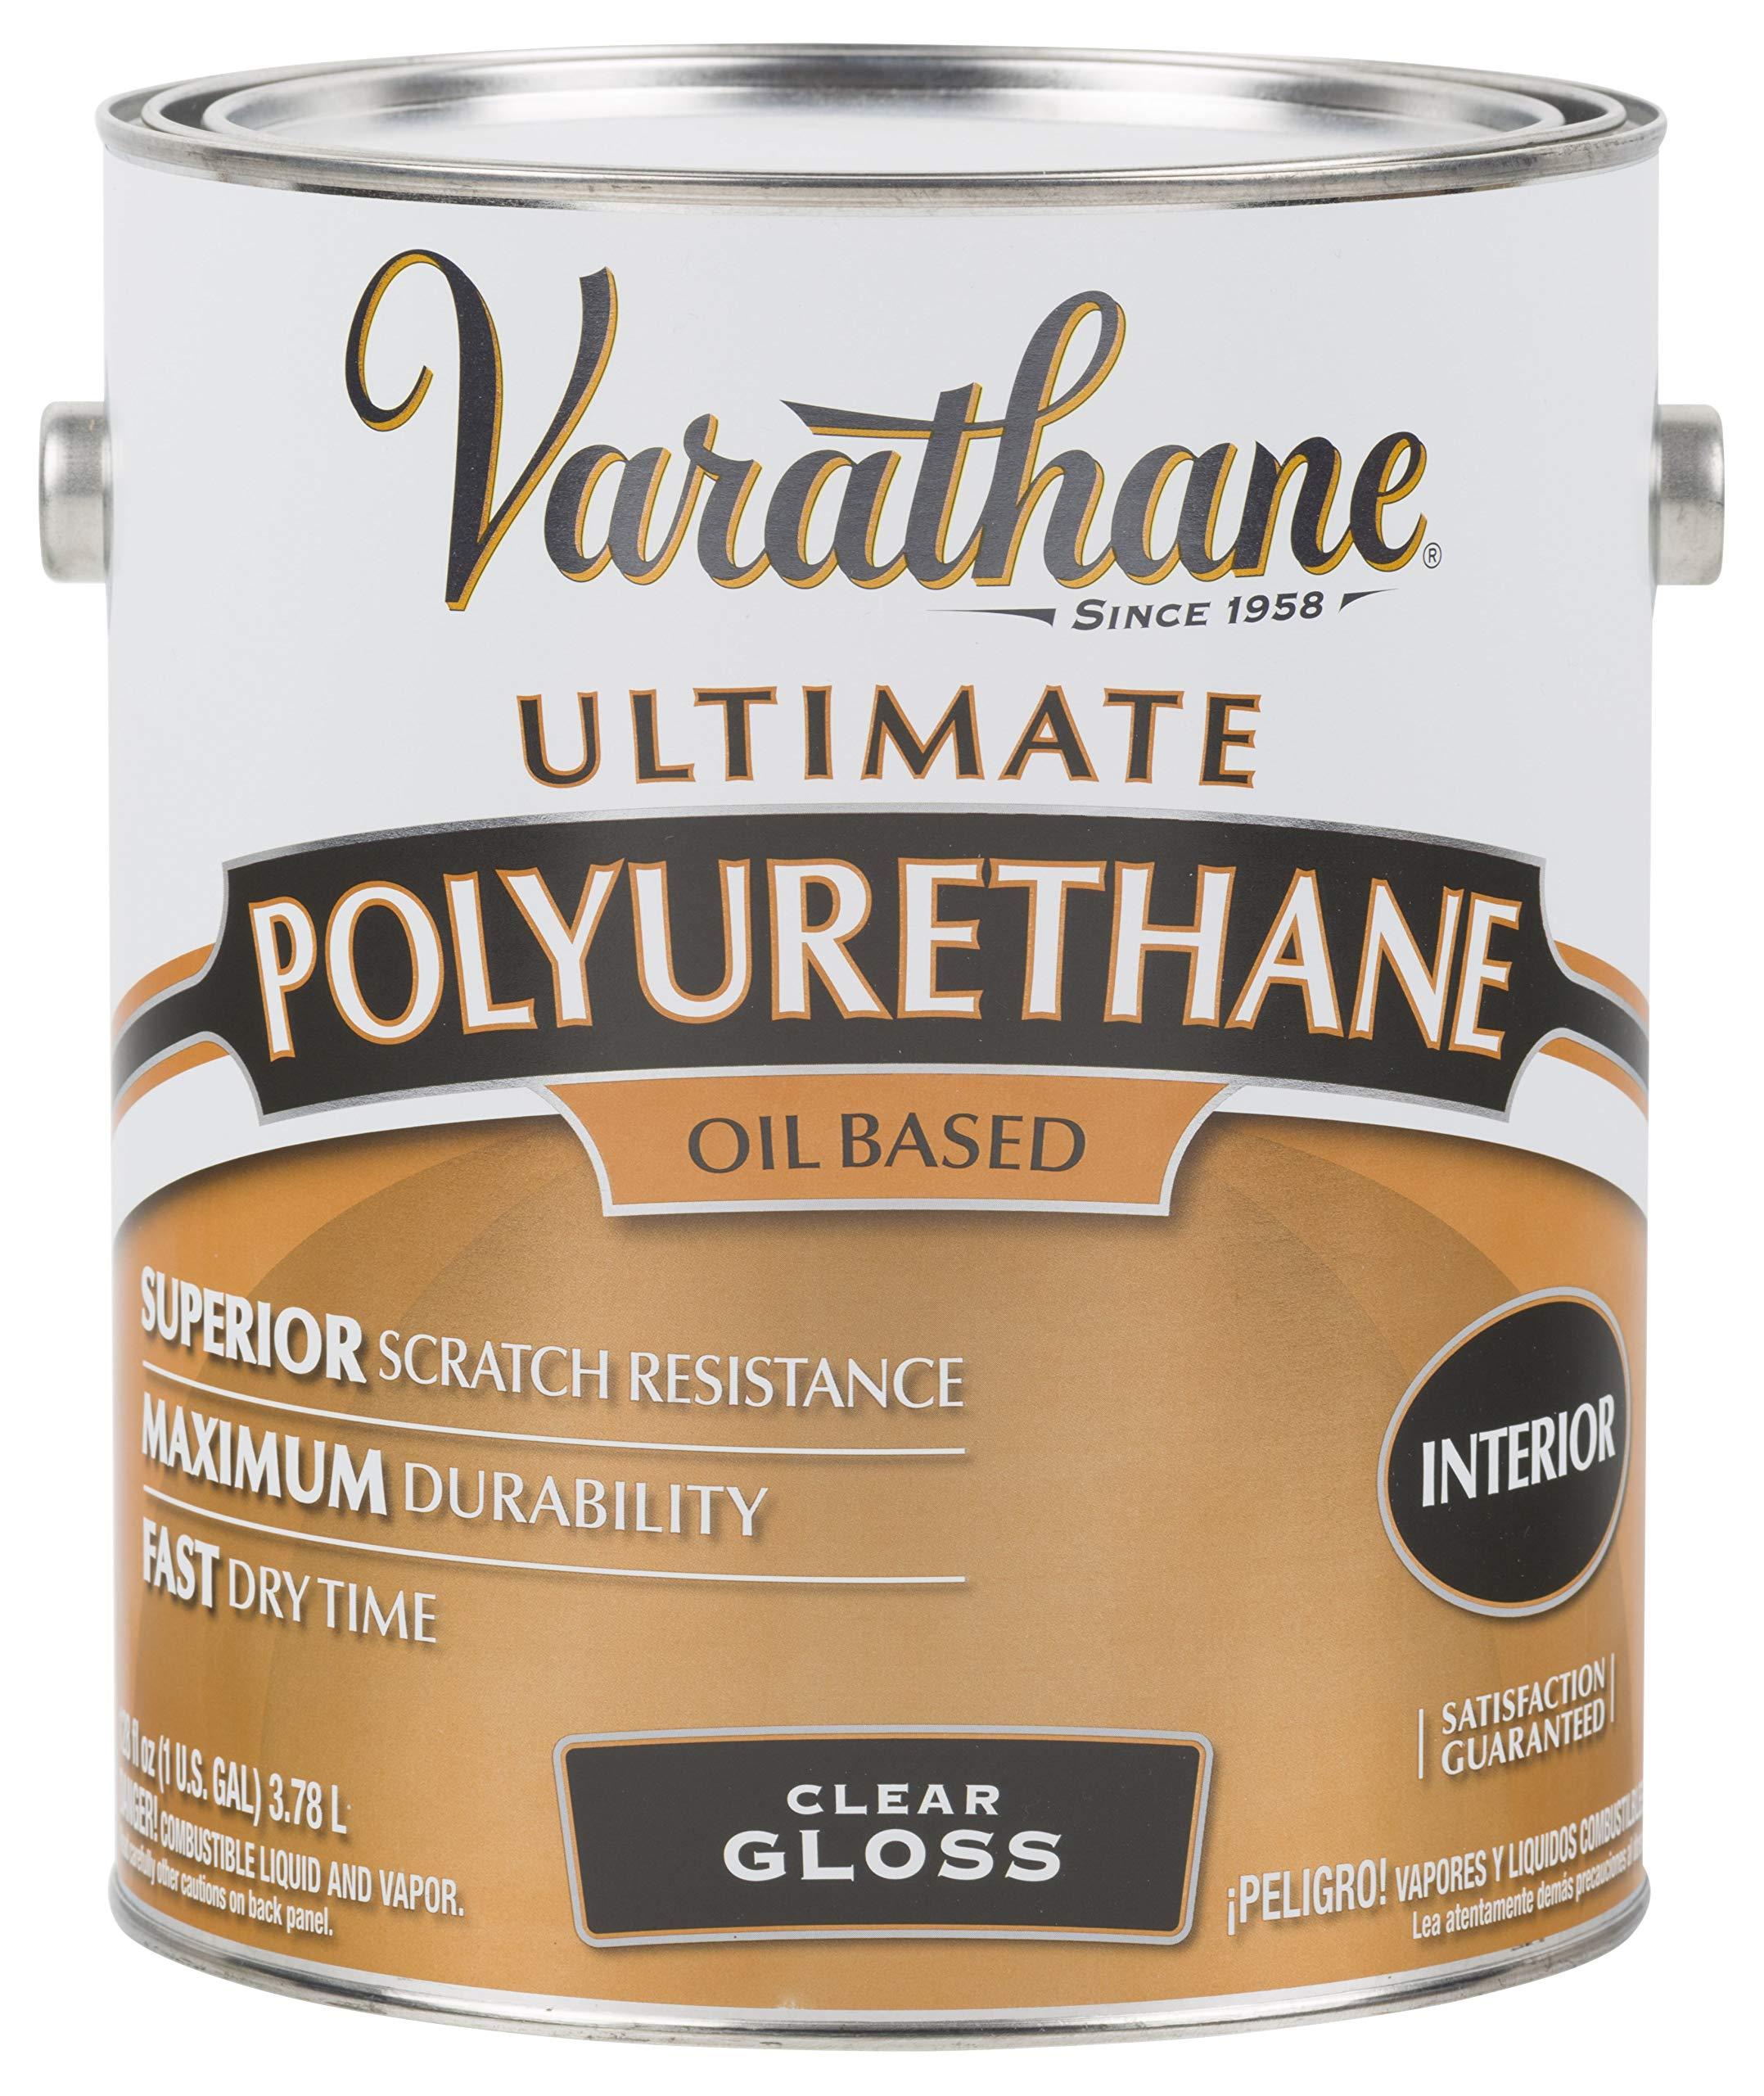 RUST-OLEUM 9032 Varathane Gallon Gloss Interior Polyurethane